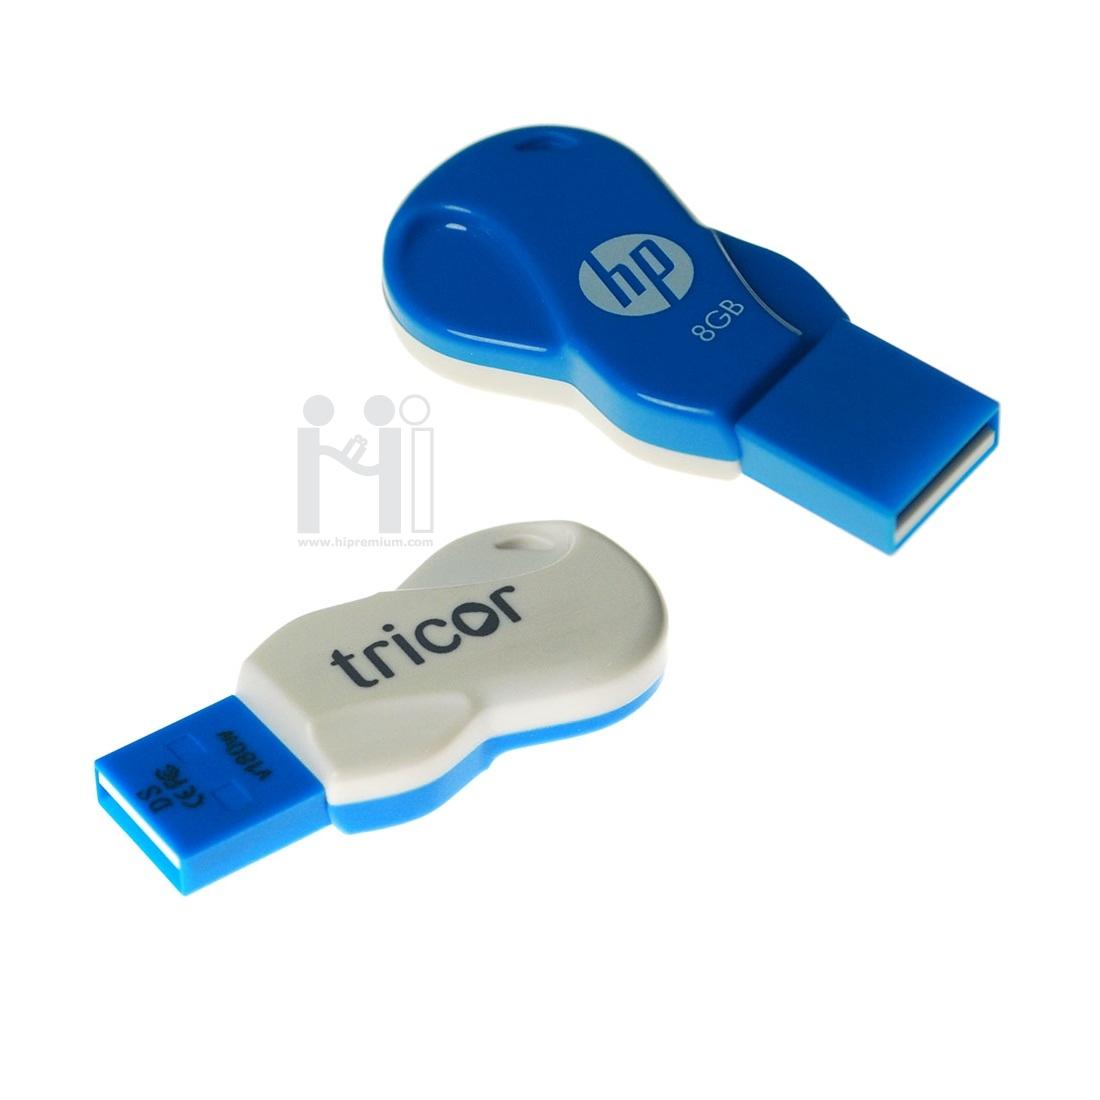 Flash Drive HP v180w แฟลชไดร์ฟกันน้ำได้